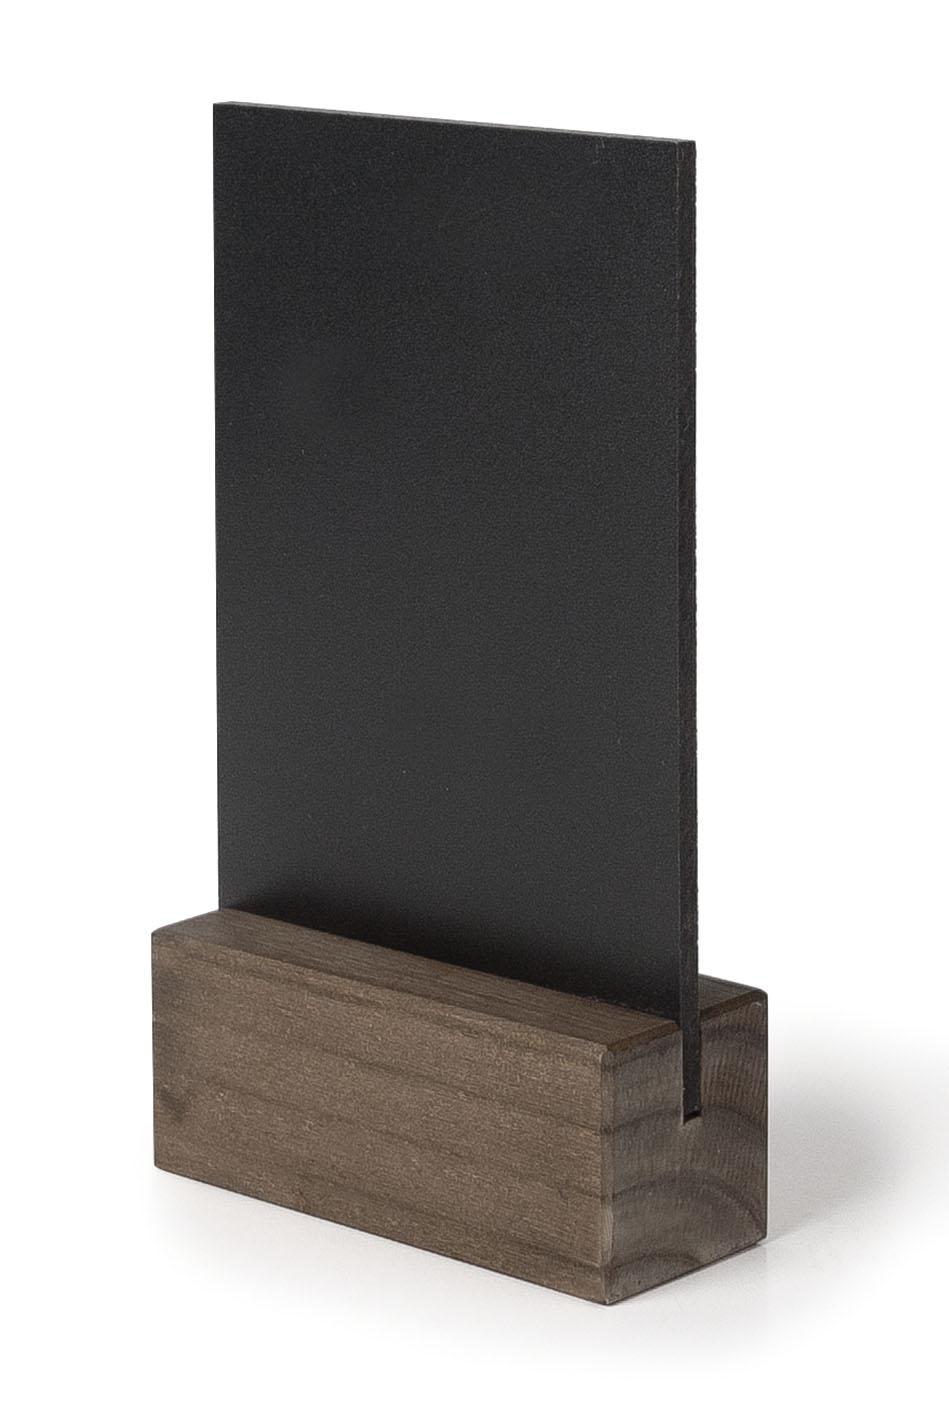 Informační tabulka 20x30 cm